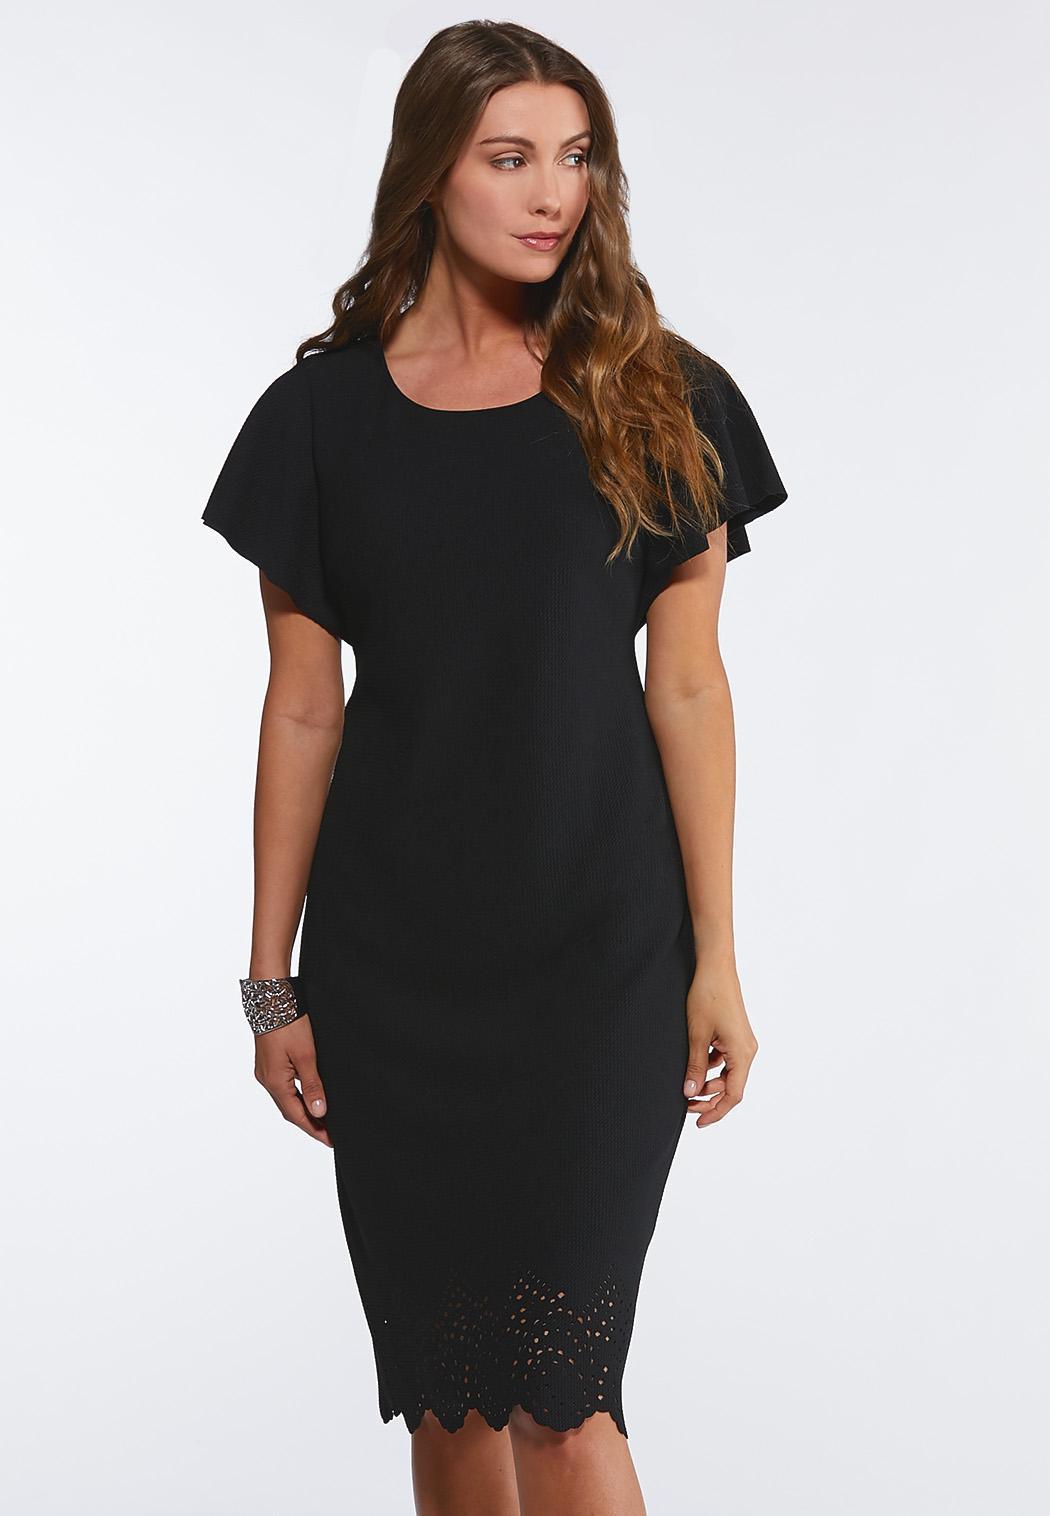 Plus Size Textured Laser Cut Dress Midi Cato Fashions